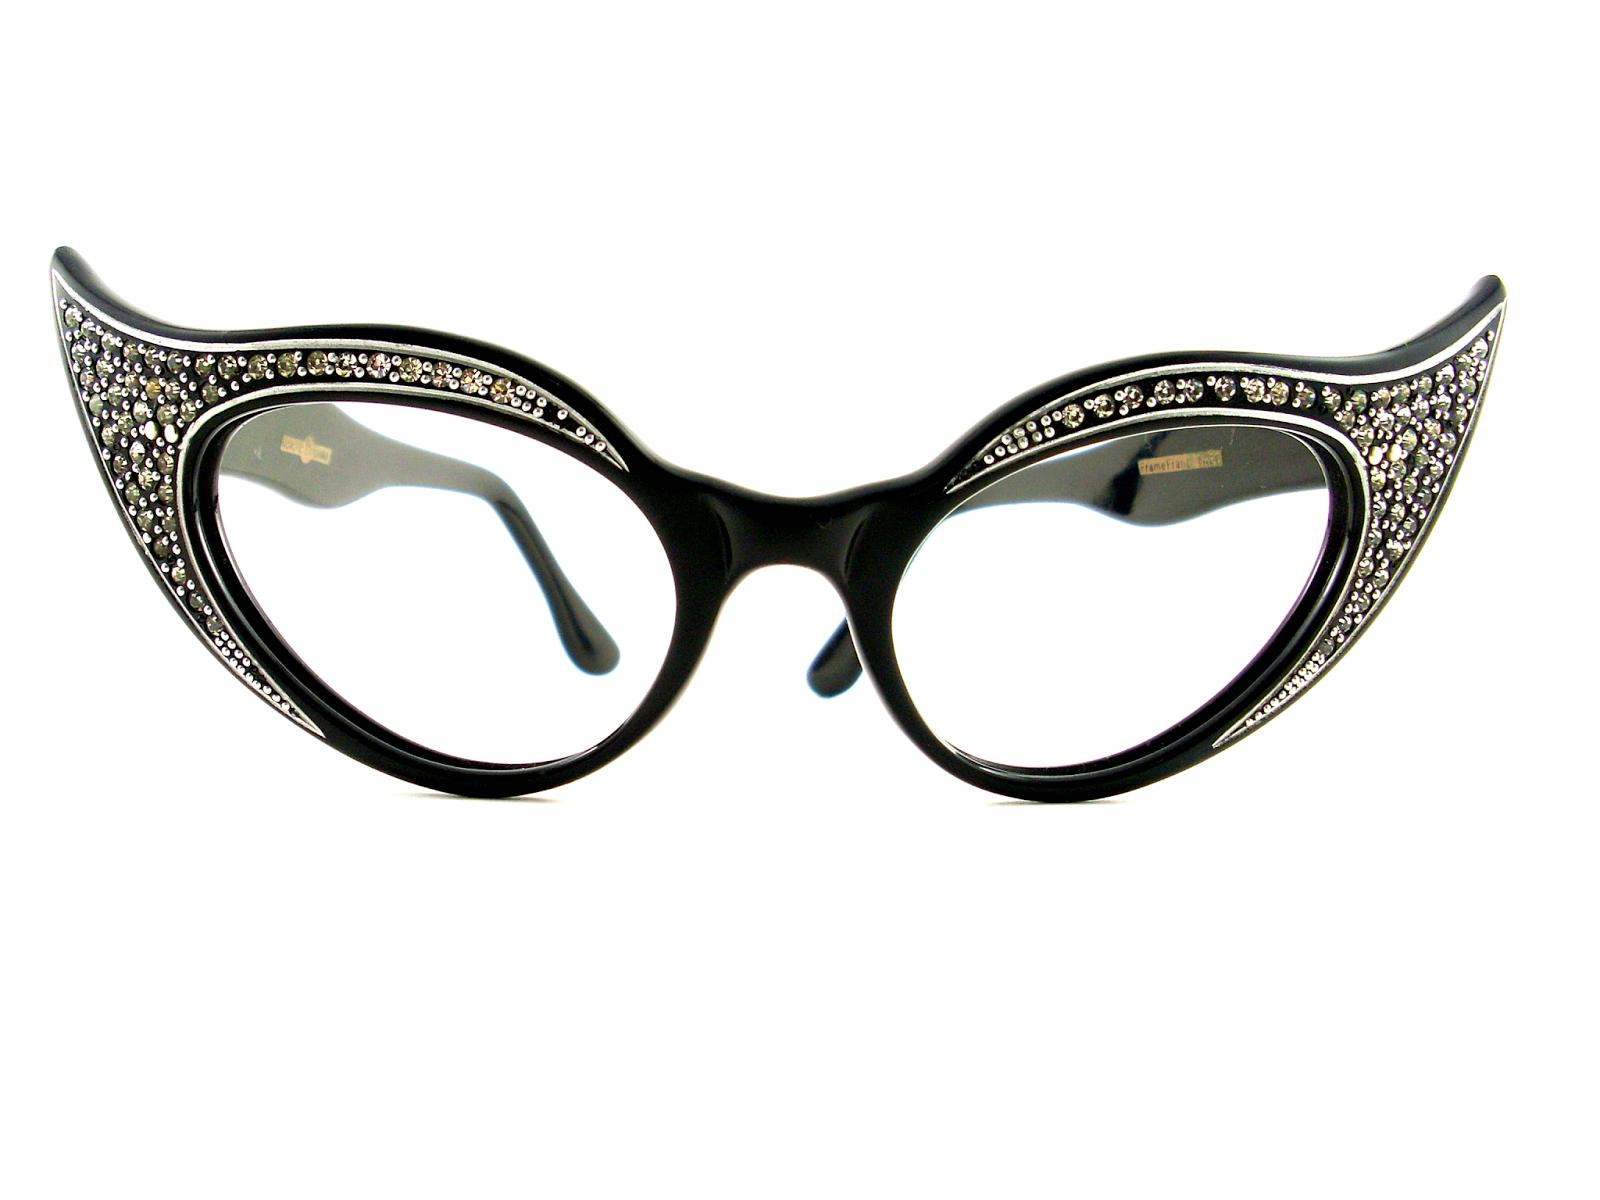 Vintage Cats Eye Glasses 42